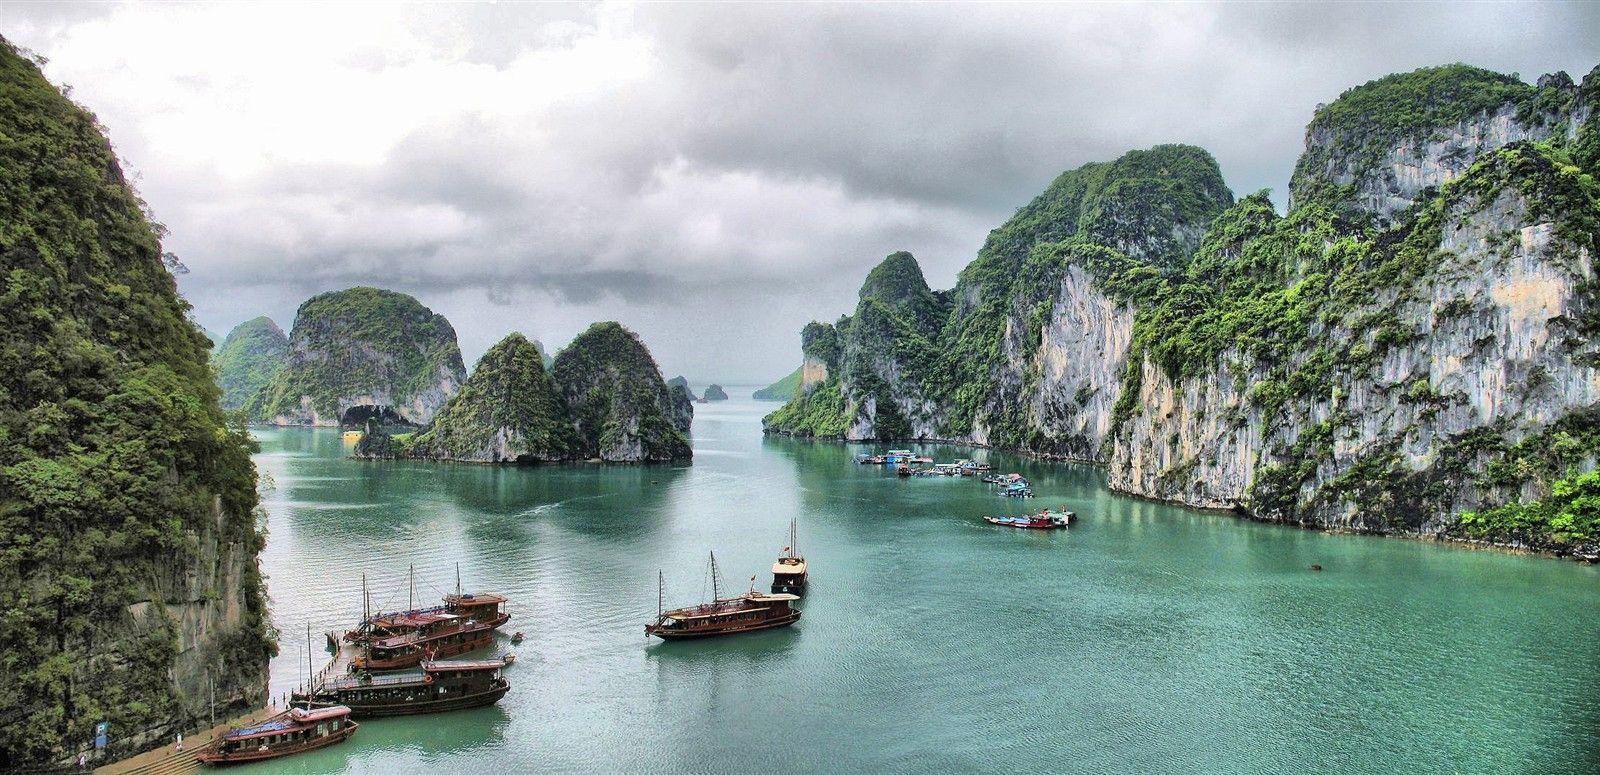 vietnam landscape - google